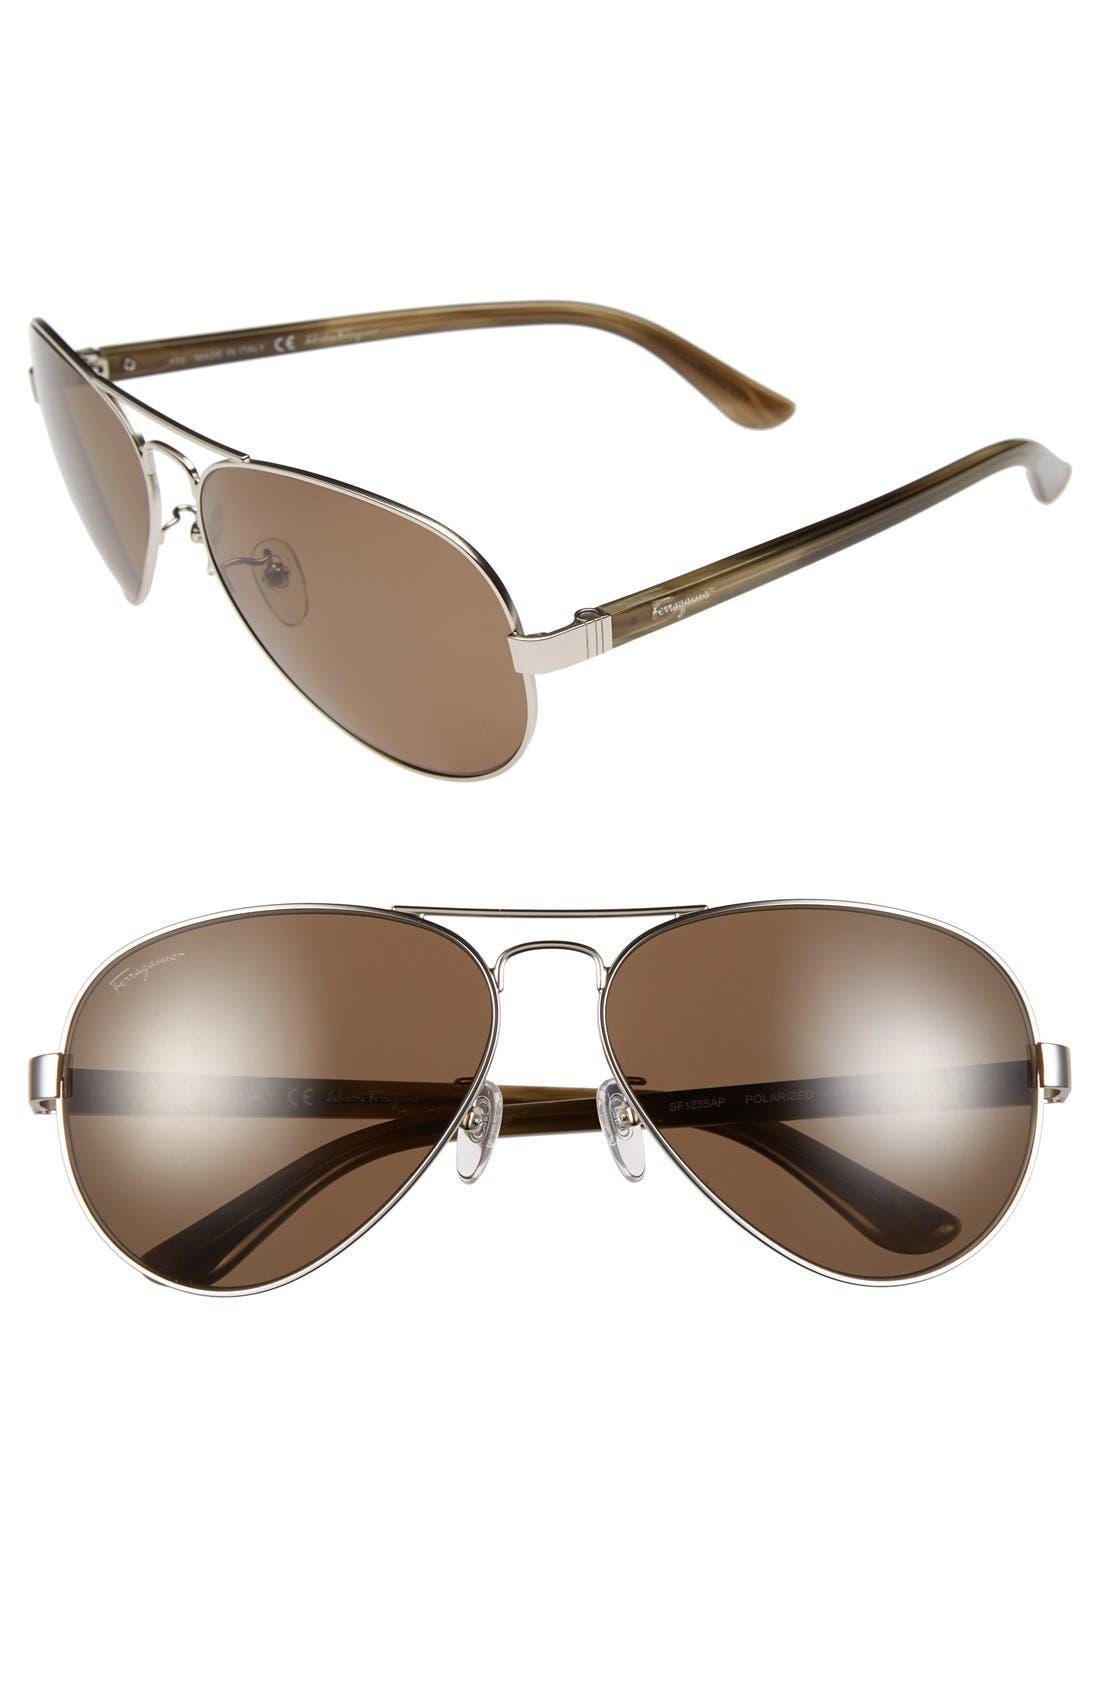 Main Image - Salvatore Ferragamo 62mm Aviator Sunglasses